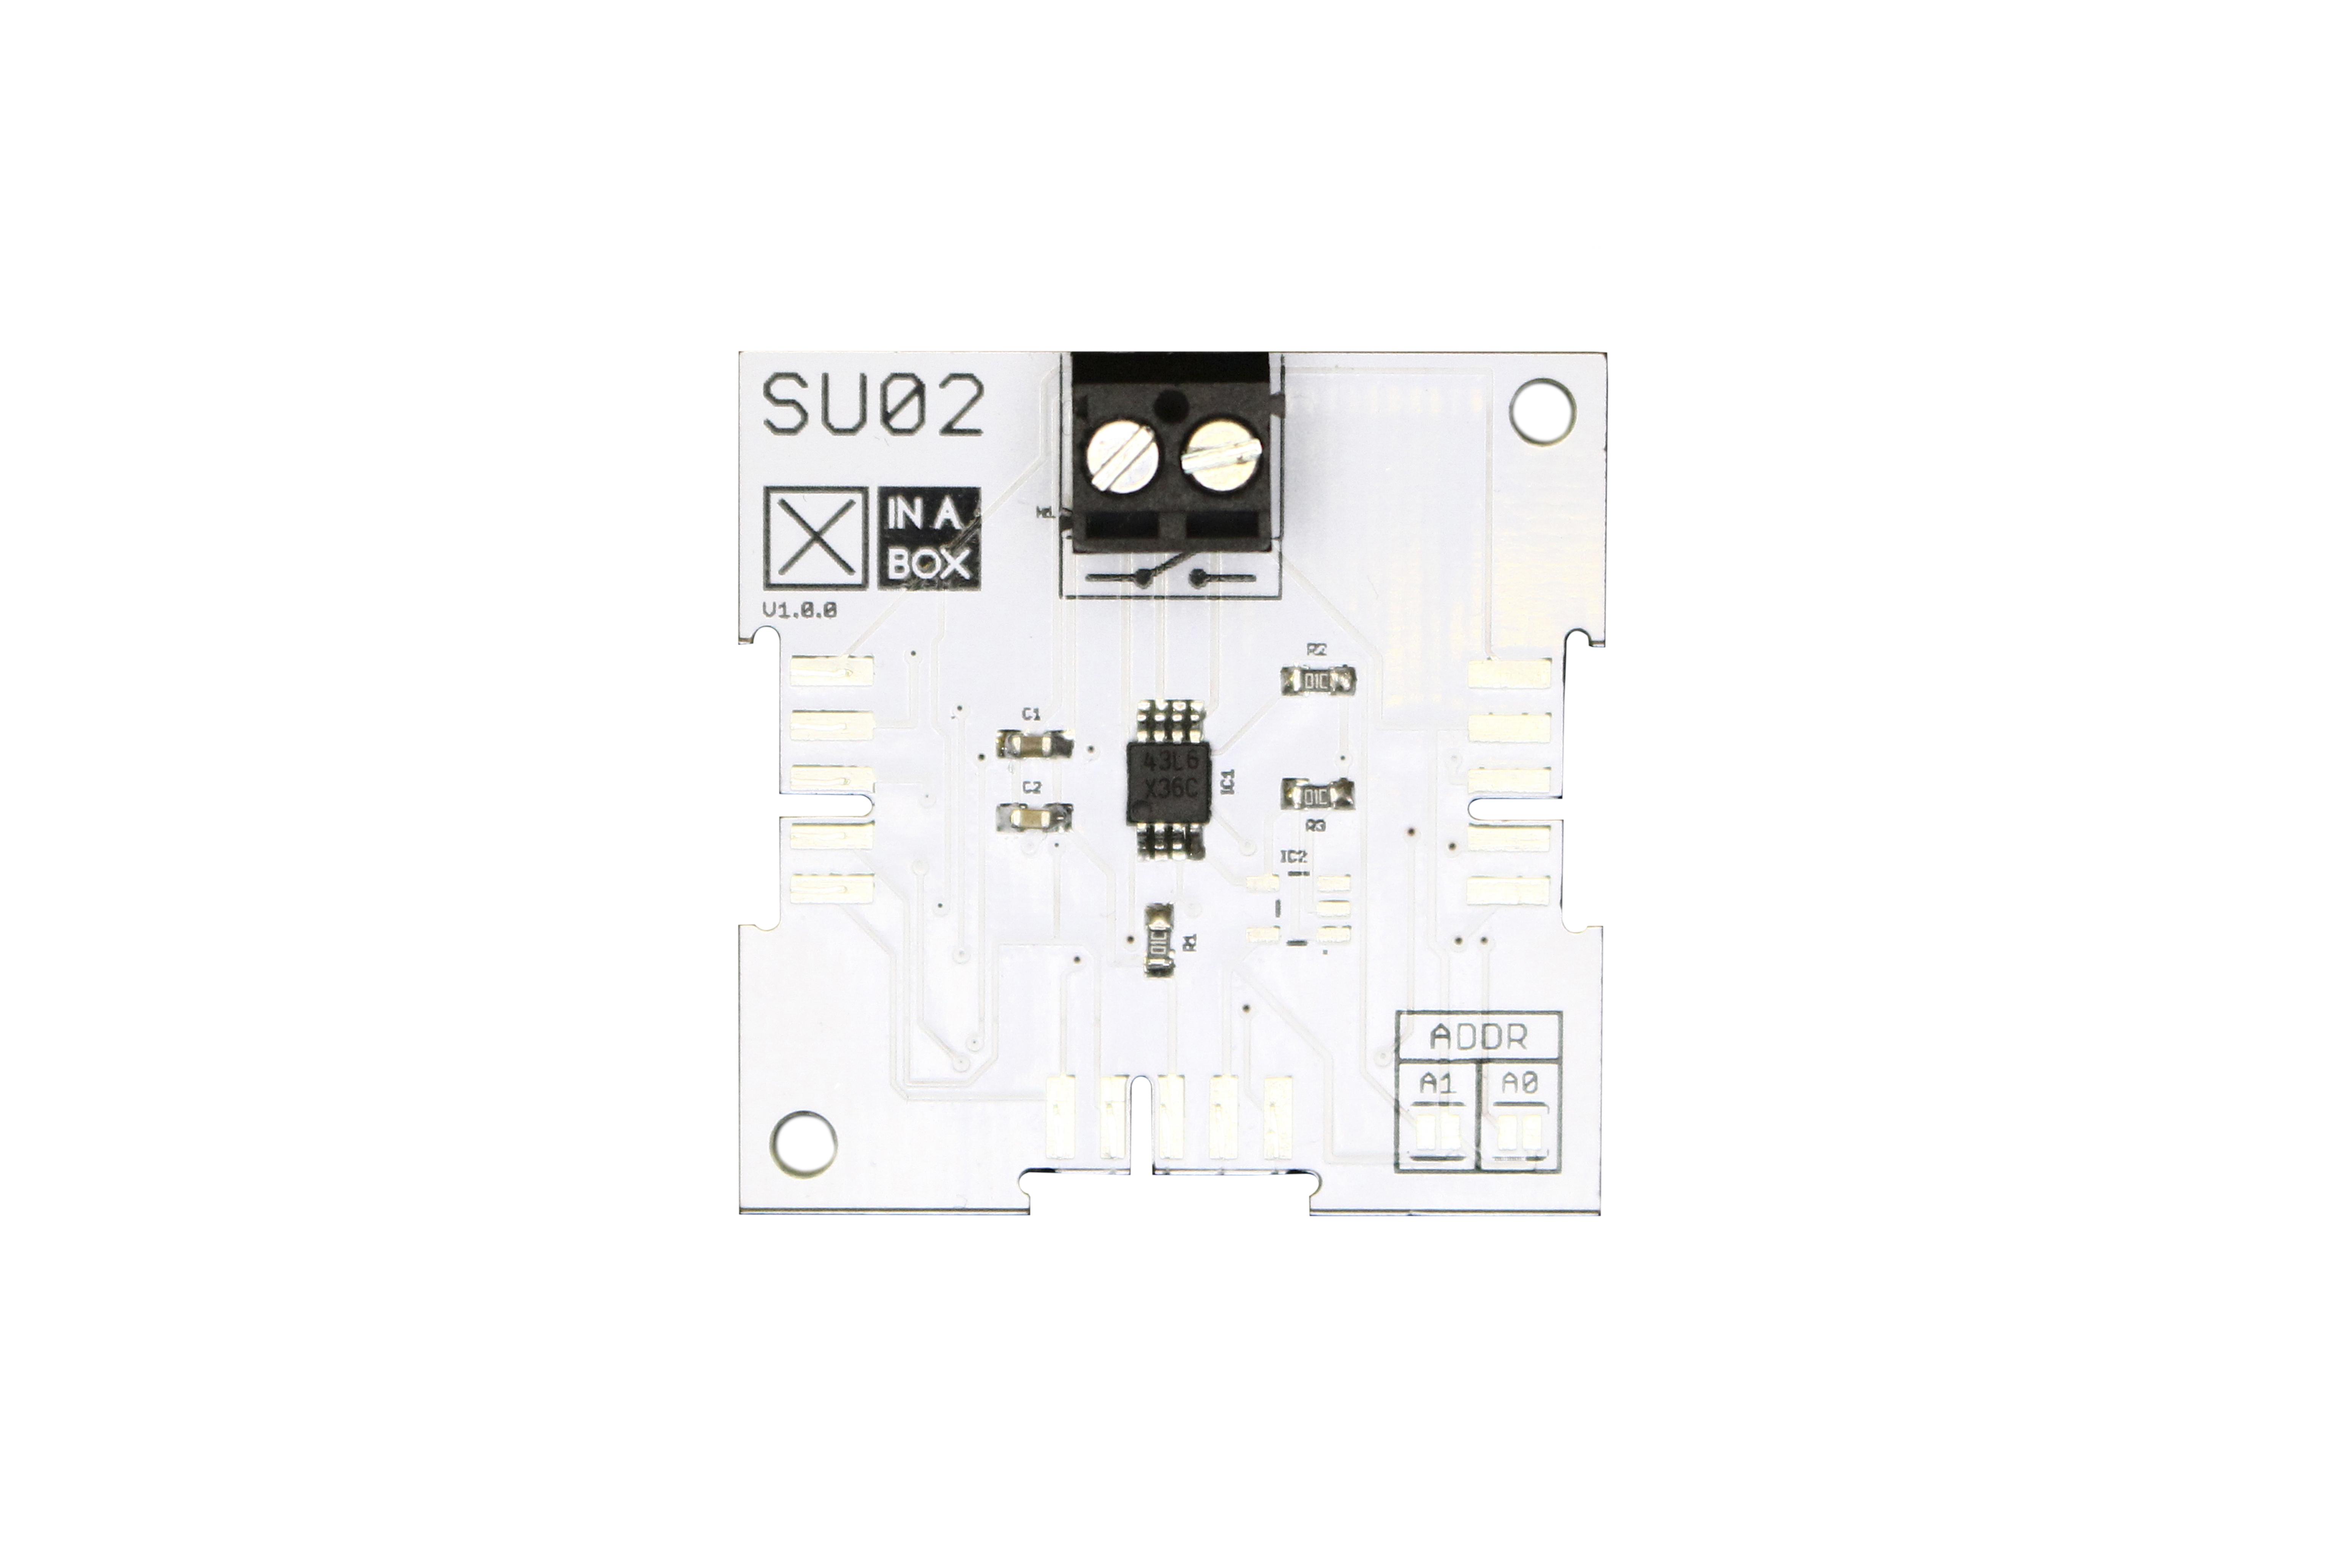 Input digitale universale (ADC081C021)